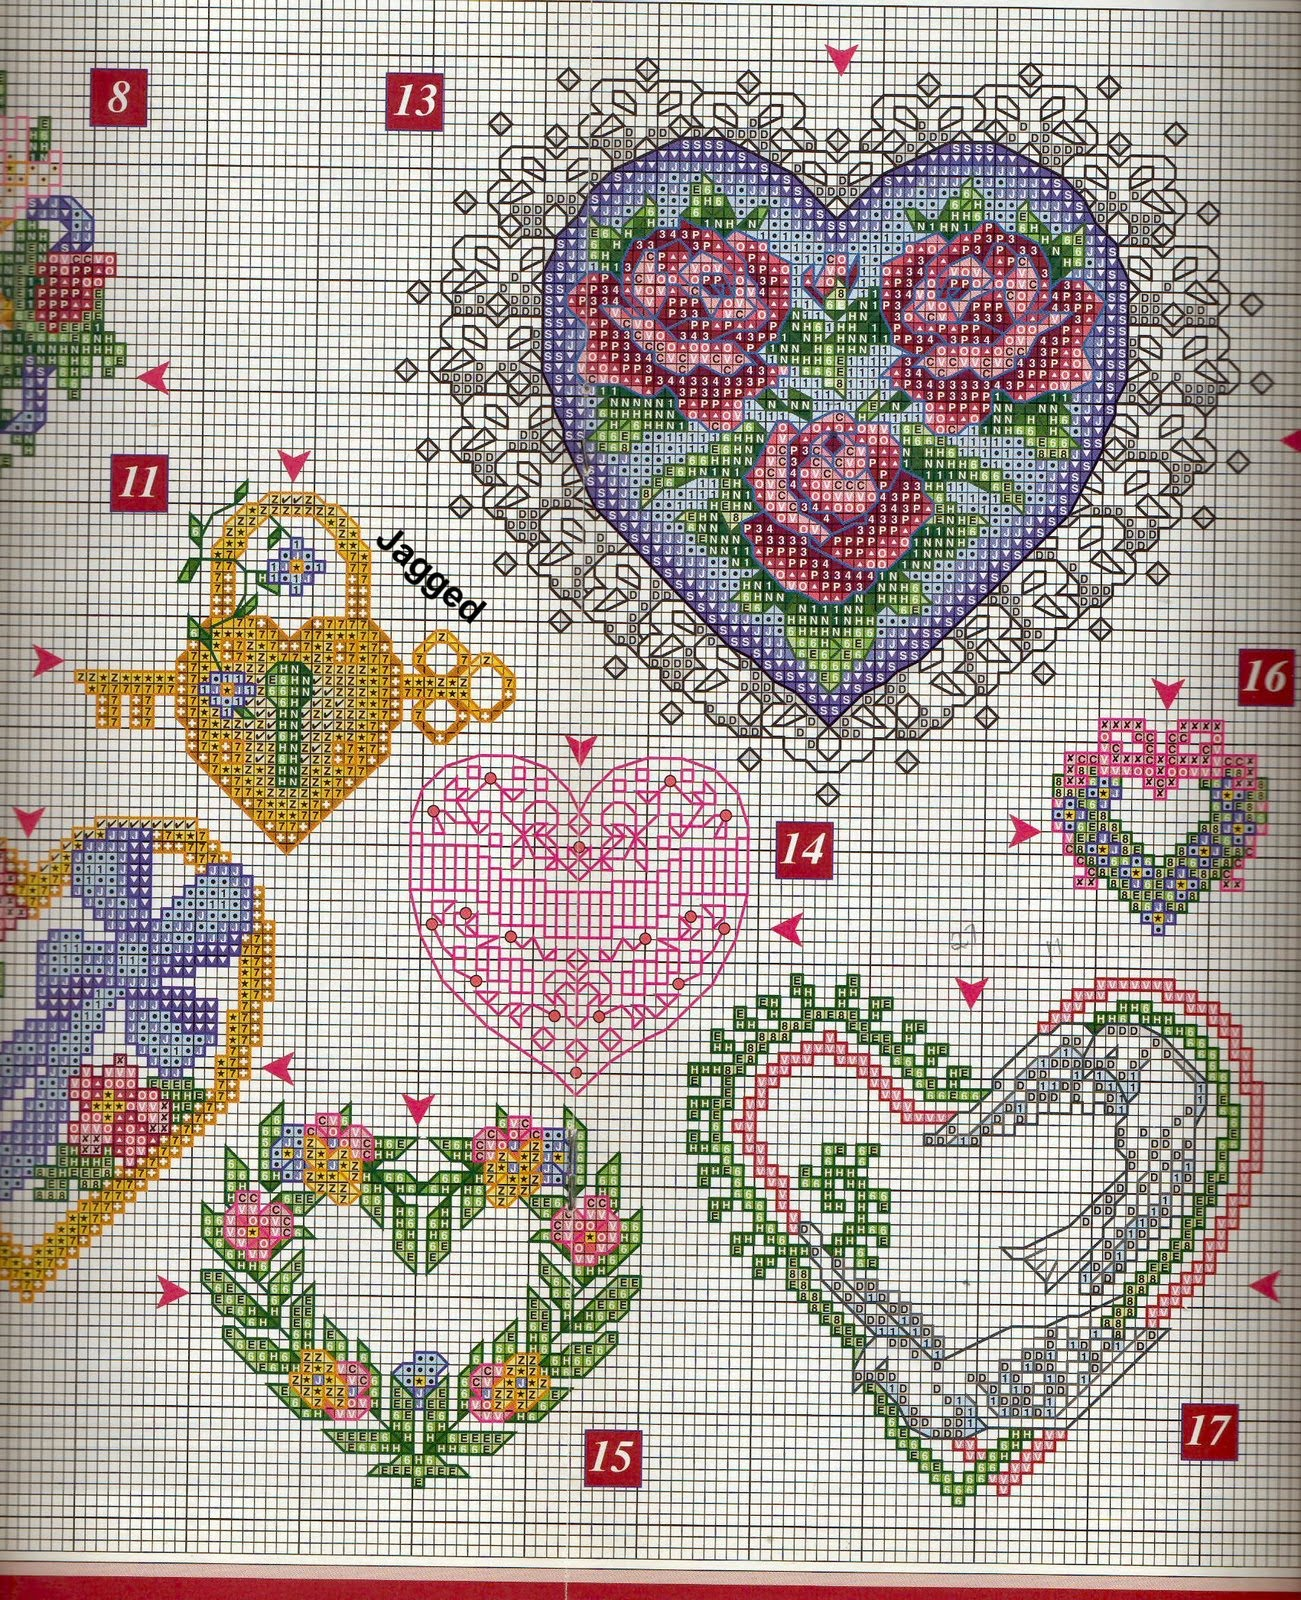 схема сердечка крестиком